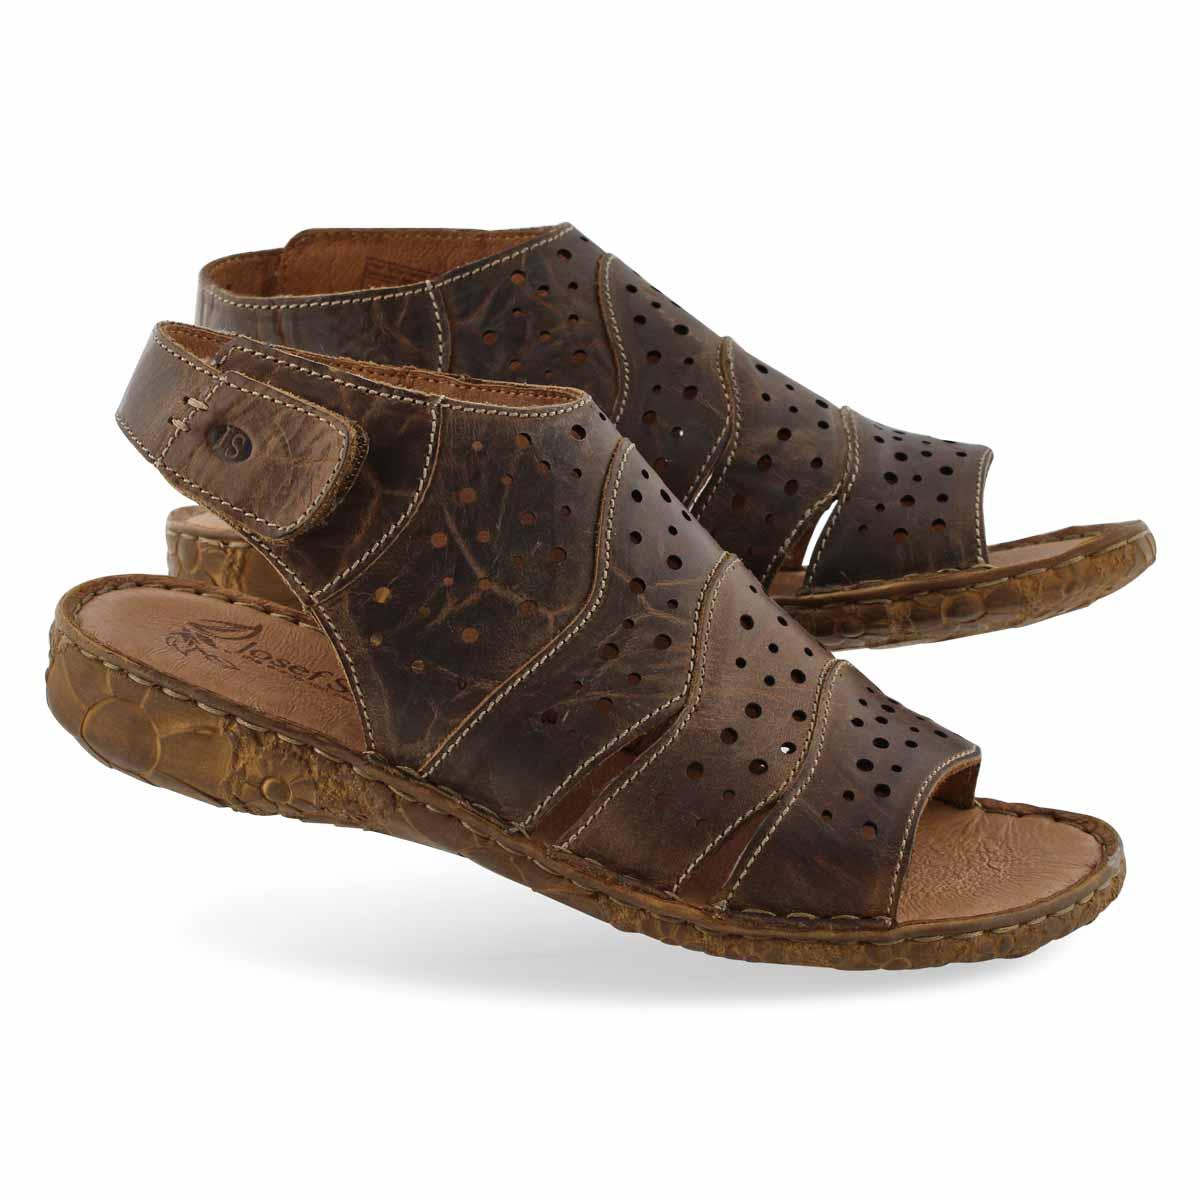 Women's ROSALIE 31 brandy casual sandals